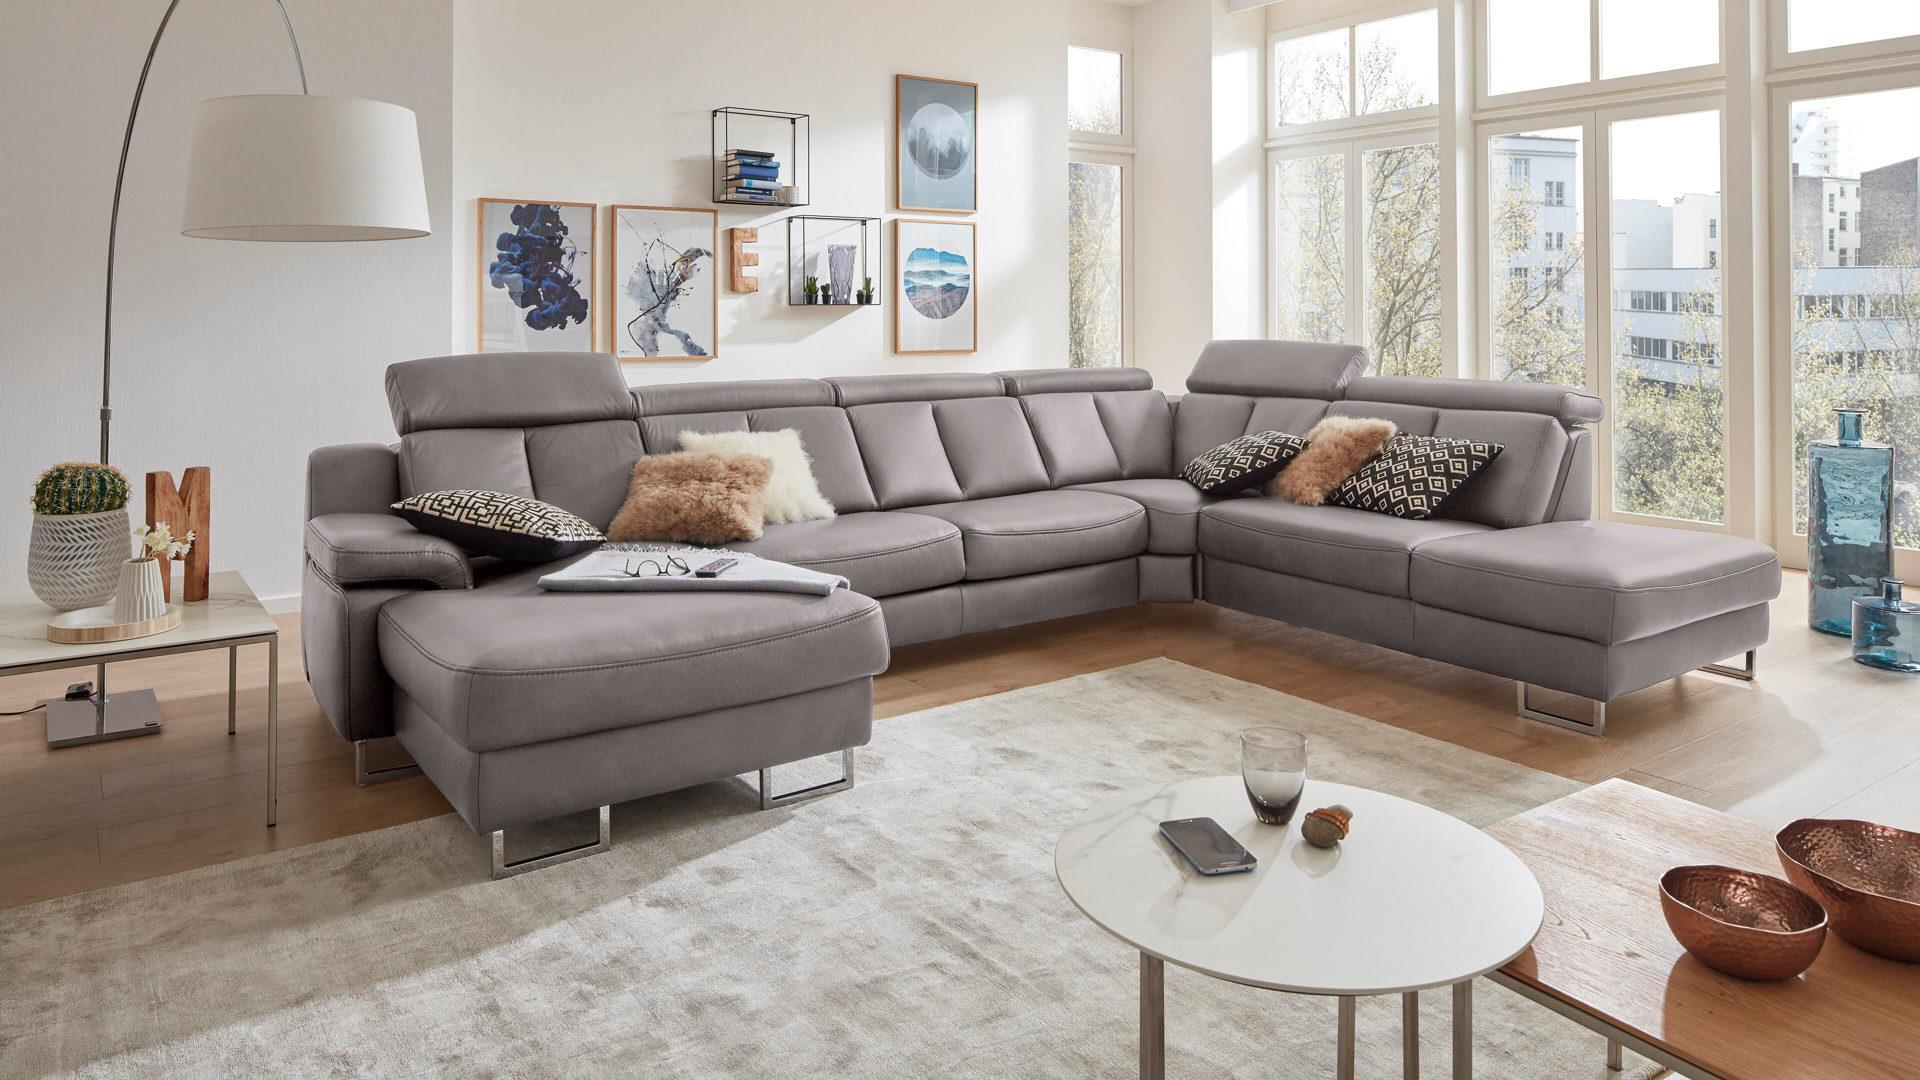 Interliving Sofa Serie 12 – Wohnlandschaft, graues LongLife Leder Cloudy  Grey & Chromfüße – Stellfläche ca. 12 x 12 c